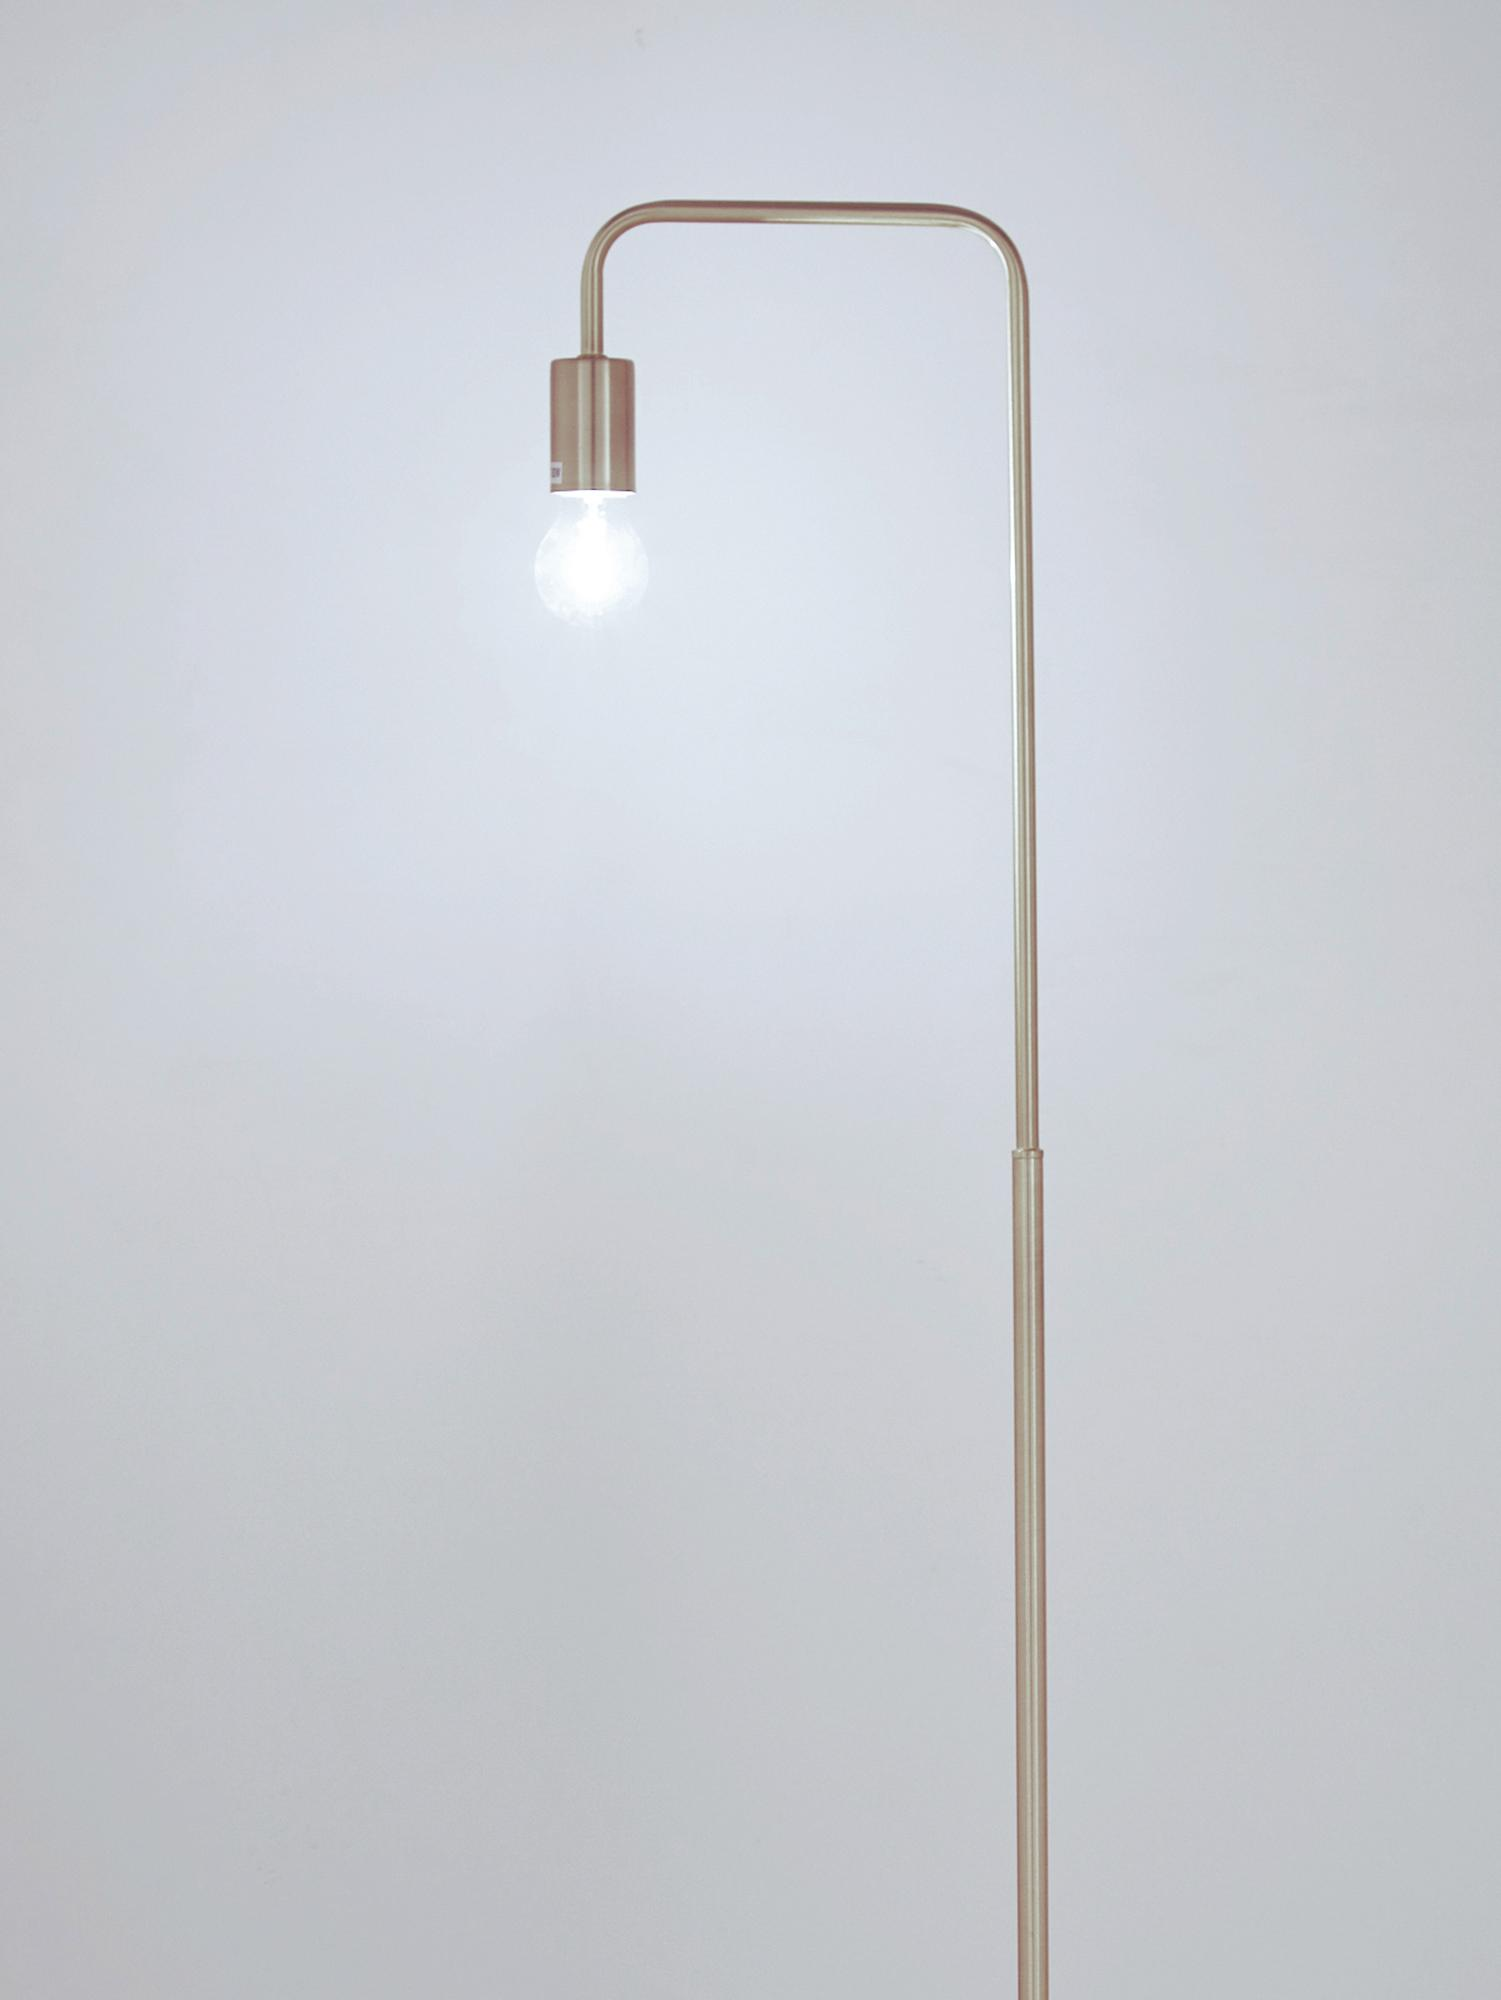 Lampada da terra dorata Flow, Ottone spazzolato, Larg. 33 x Alt. 154 cm